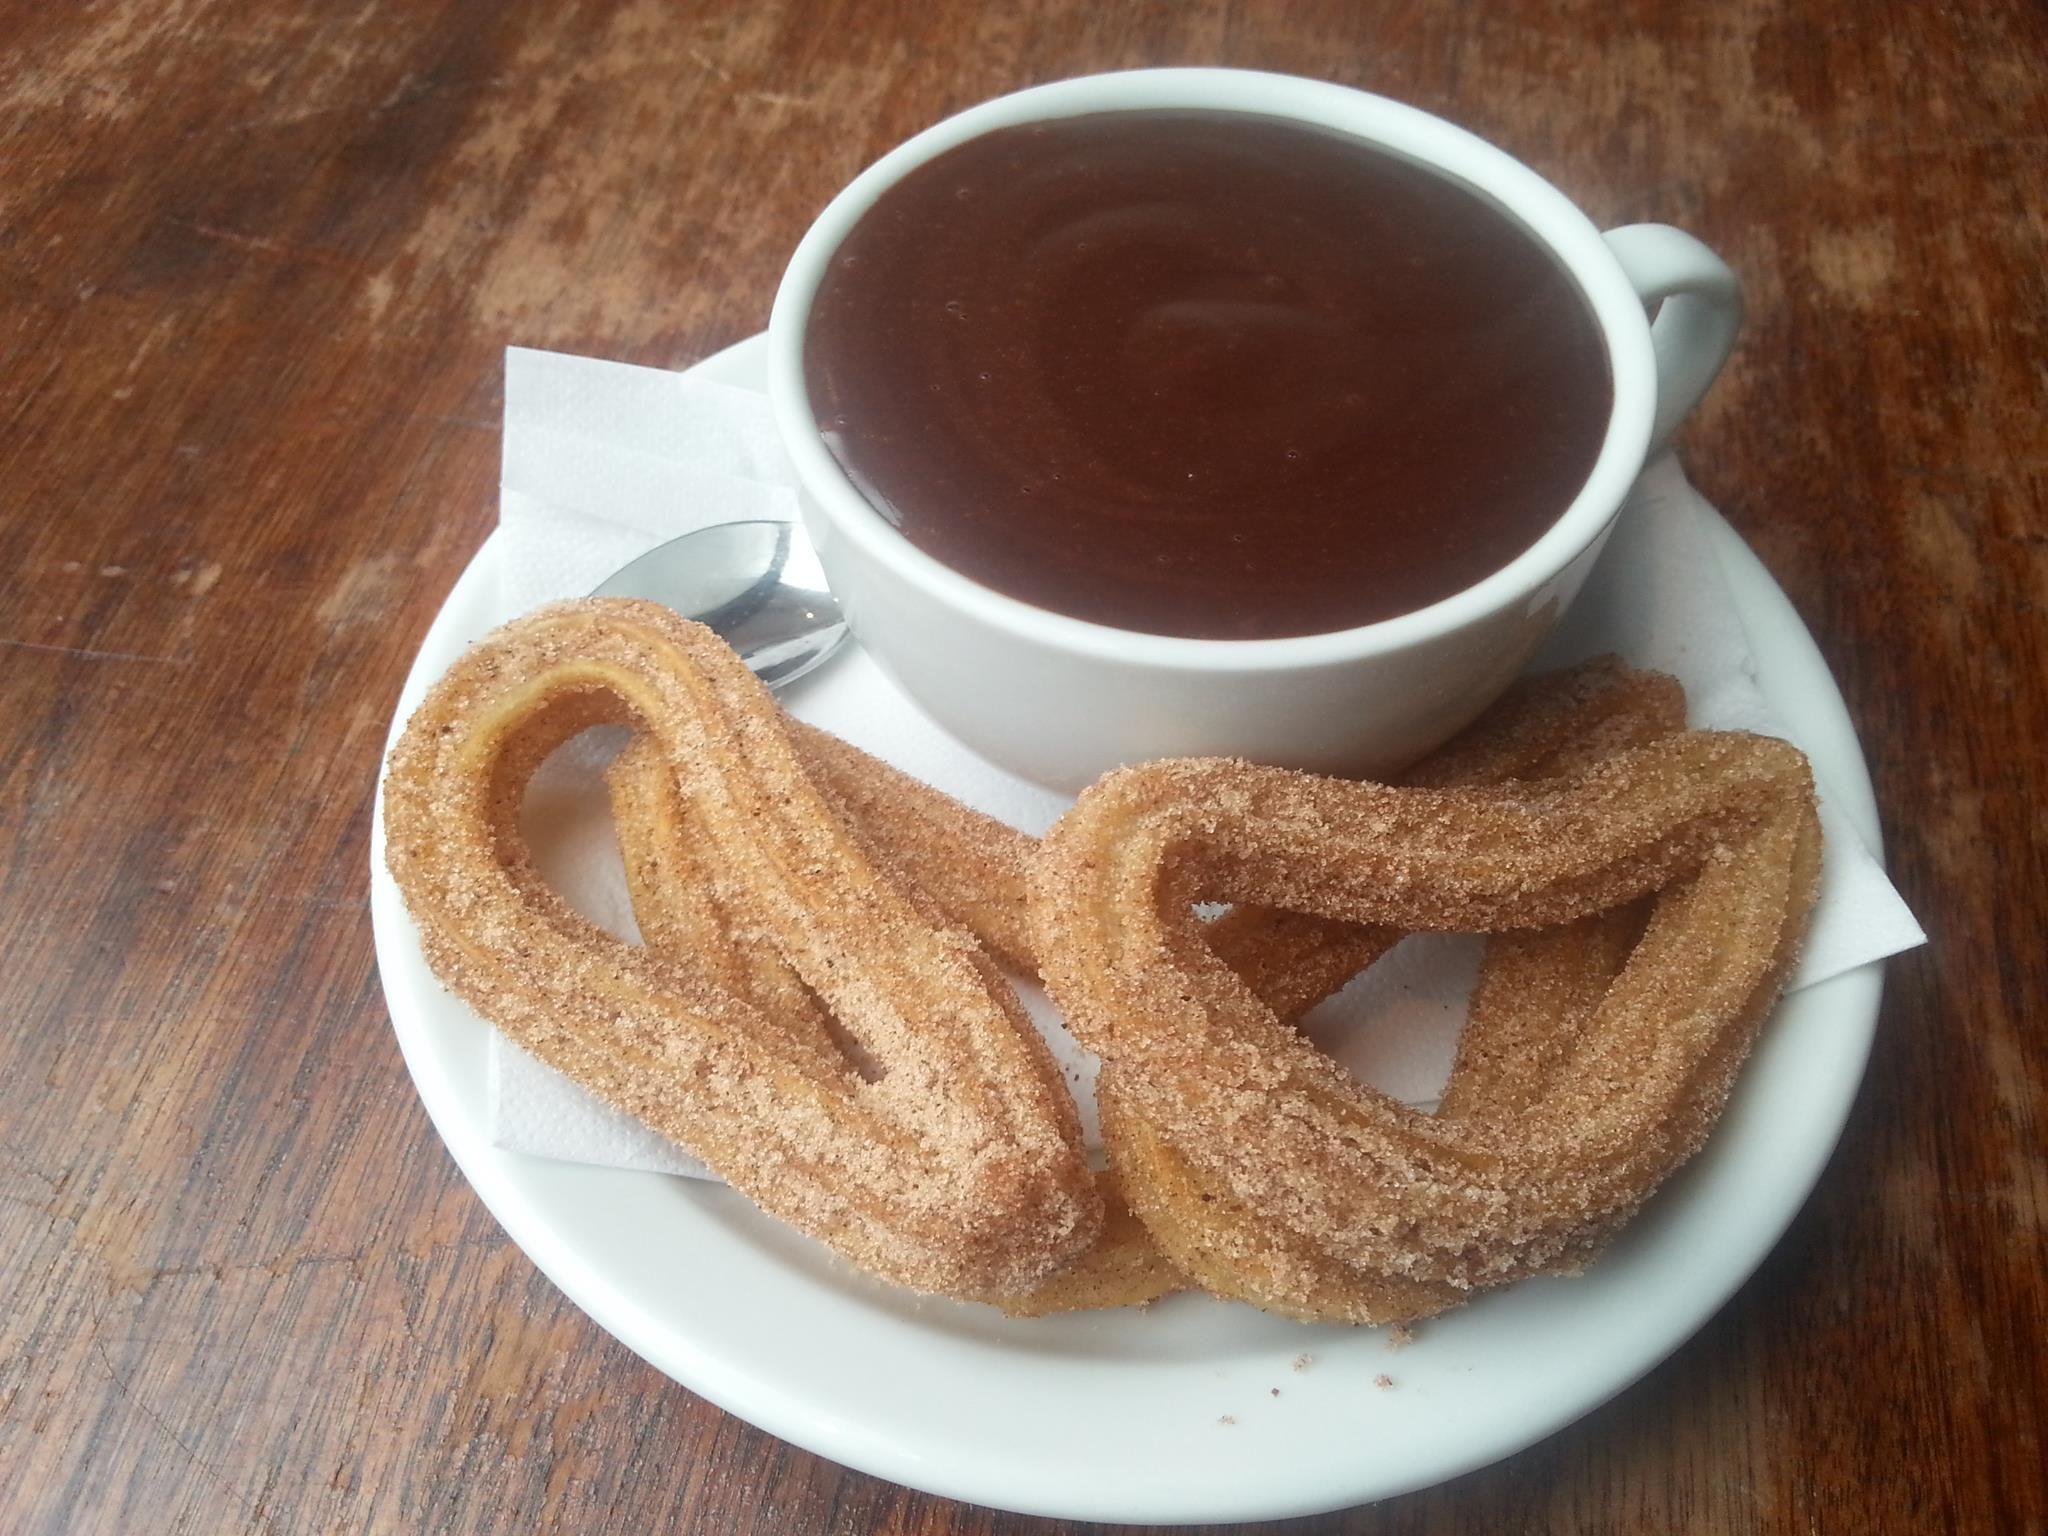 Amazing hot chocolate and churros at Ultracomida, Narberth. #TheCoastalWay